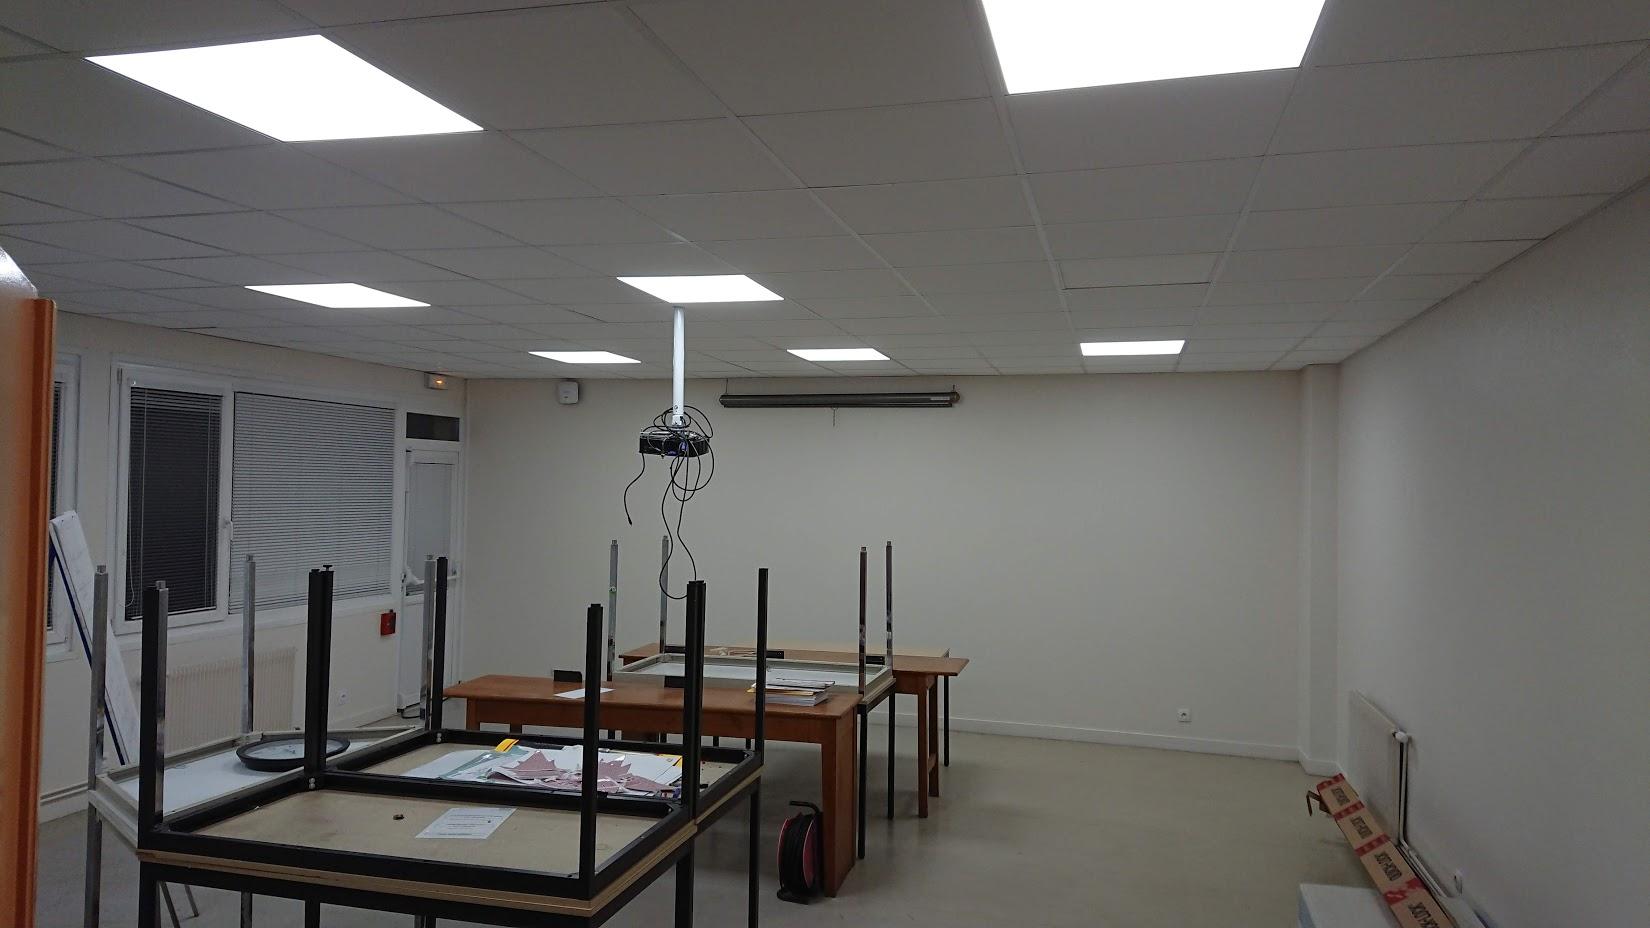 installation de faux plafonds - Plaquiste à Caen (Calvados - 14)